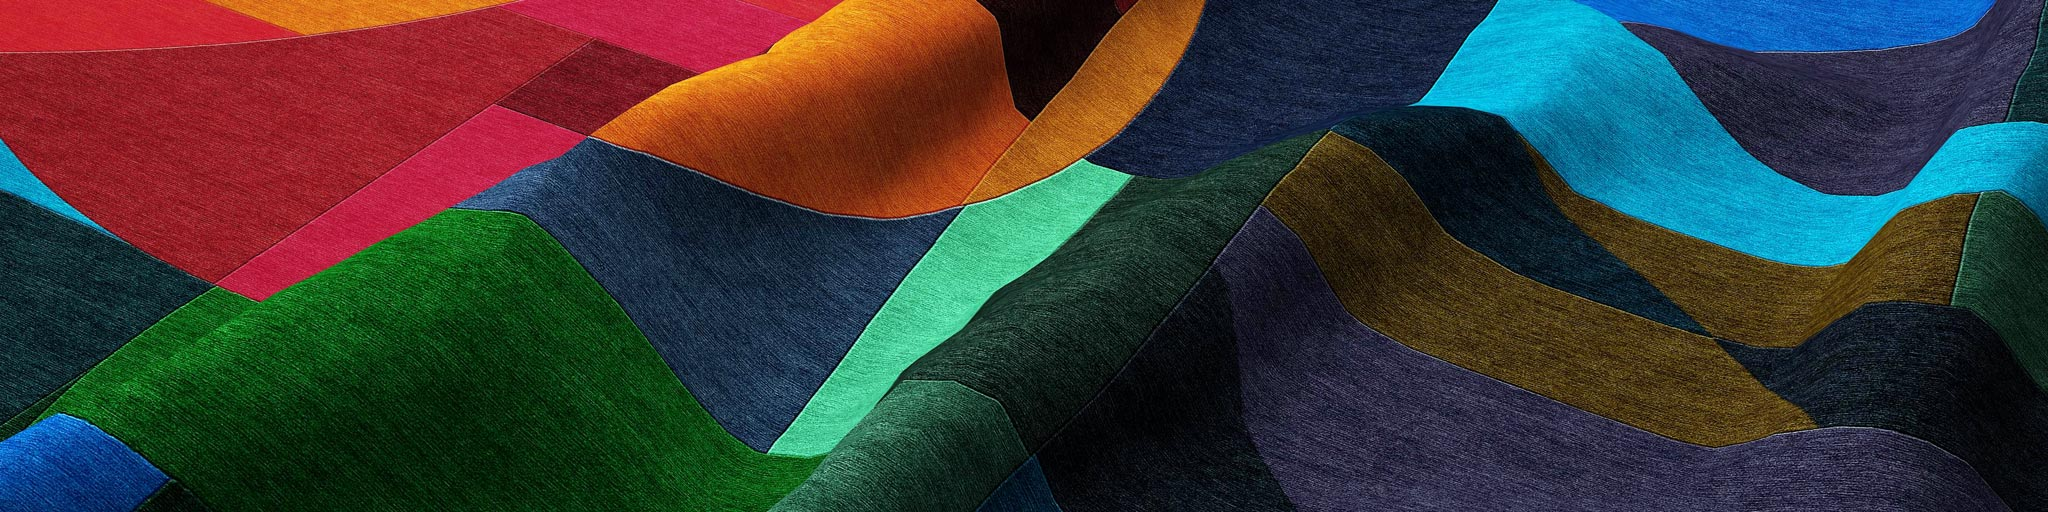 Modern Carpet Design | Galaincha